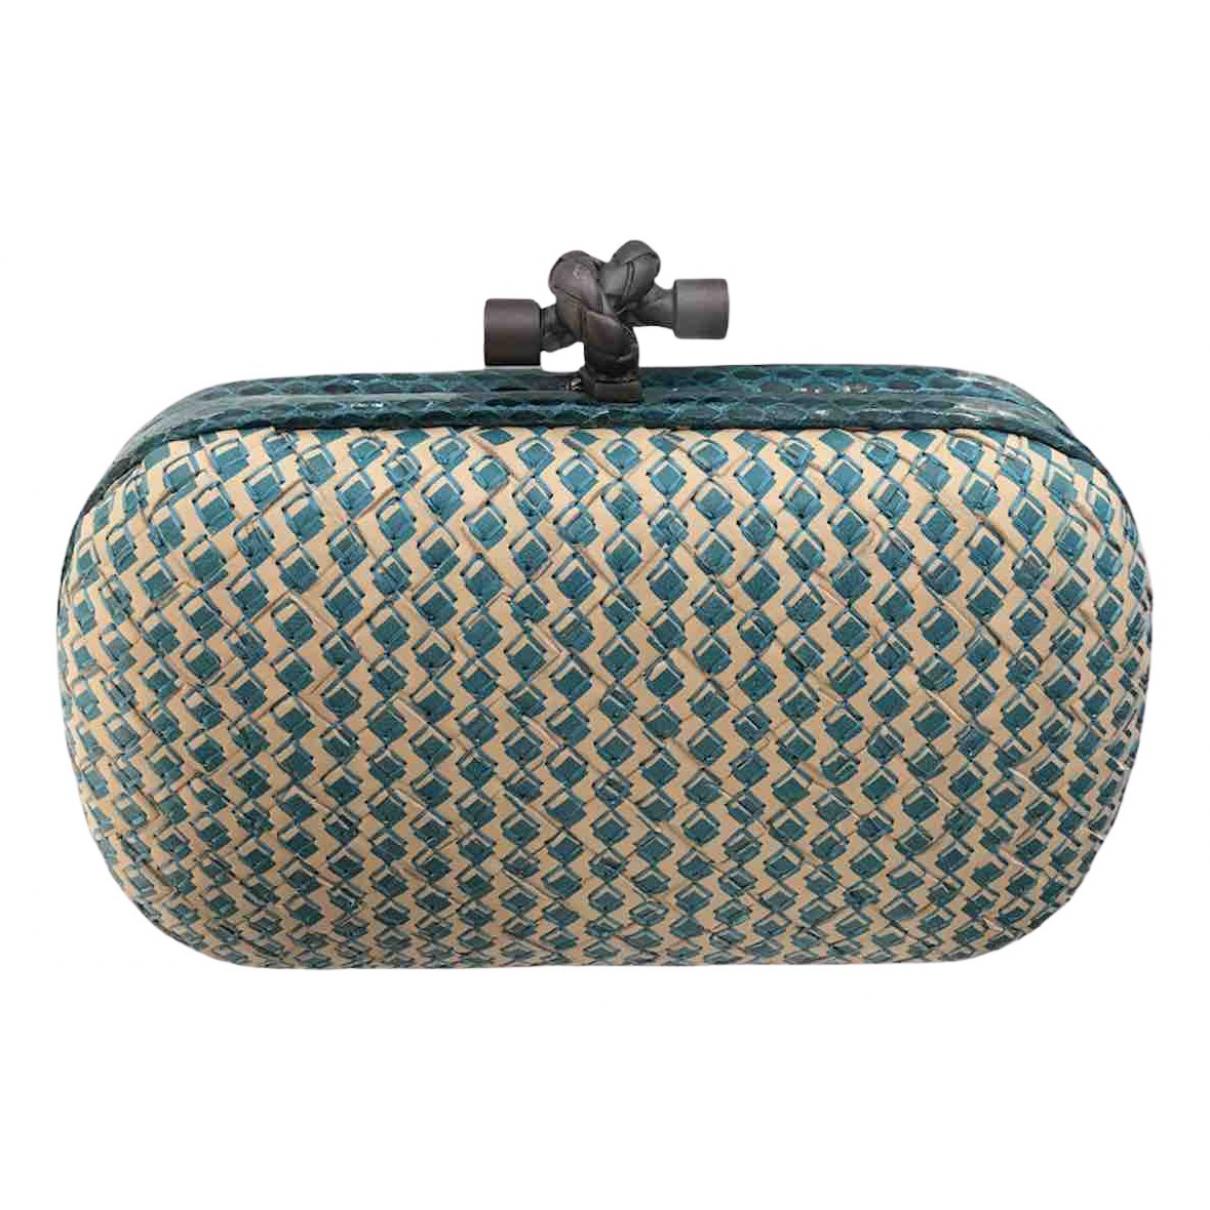 Bottega Veneta - Pochette   pour femme en python - turquoise